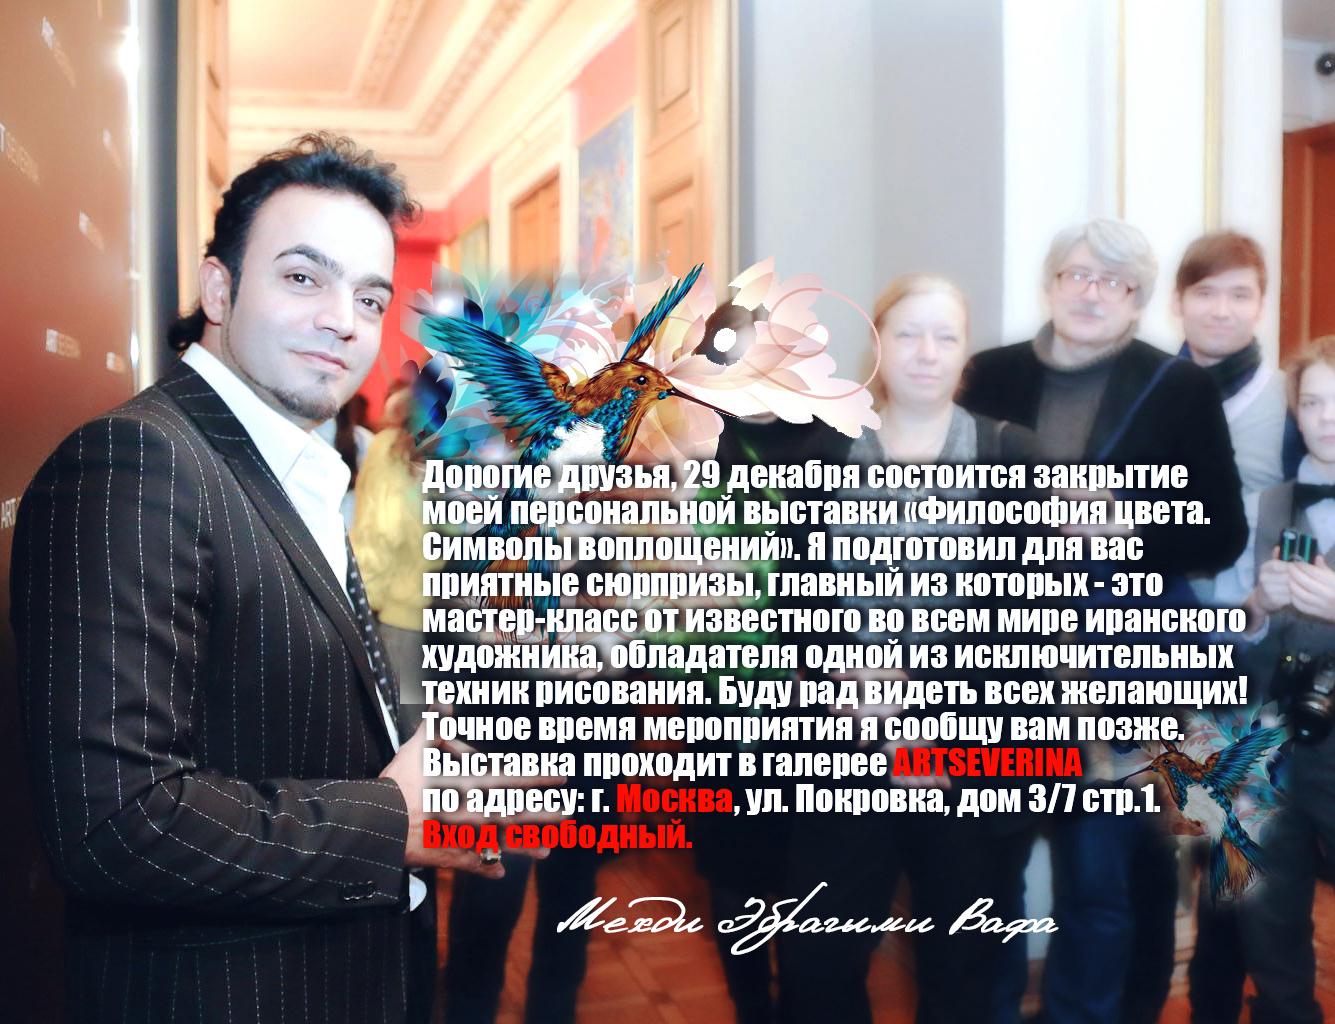 mehdi-ebrahimi-vafa-zakritie-artseverina-29-12-2016